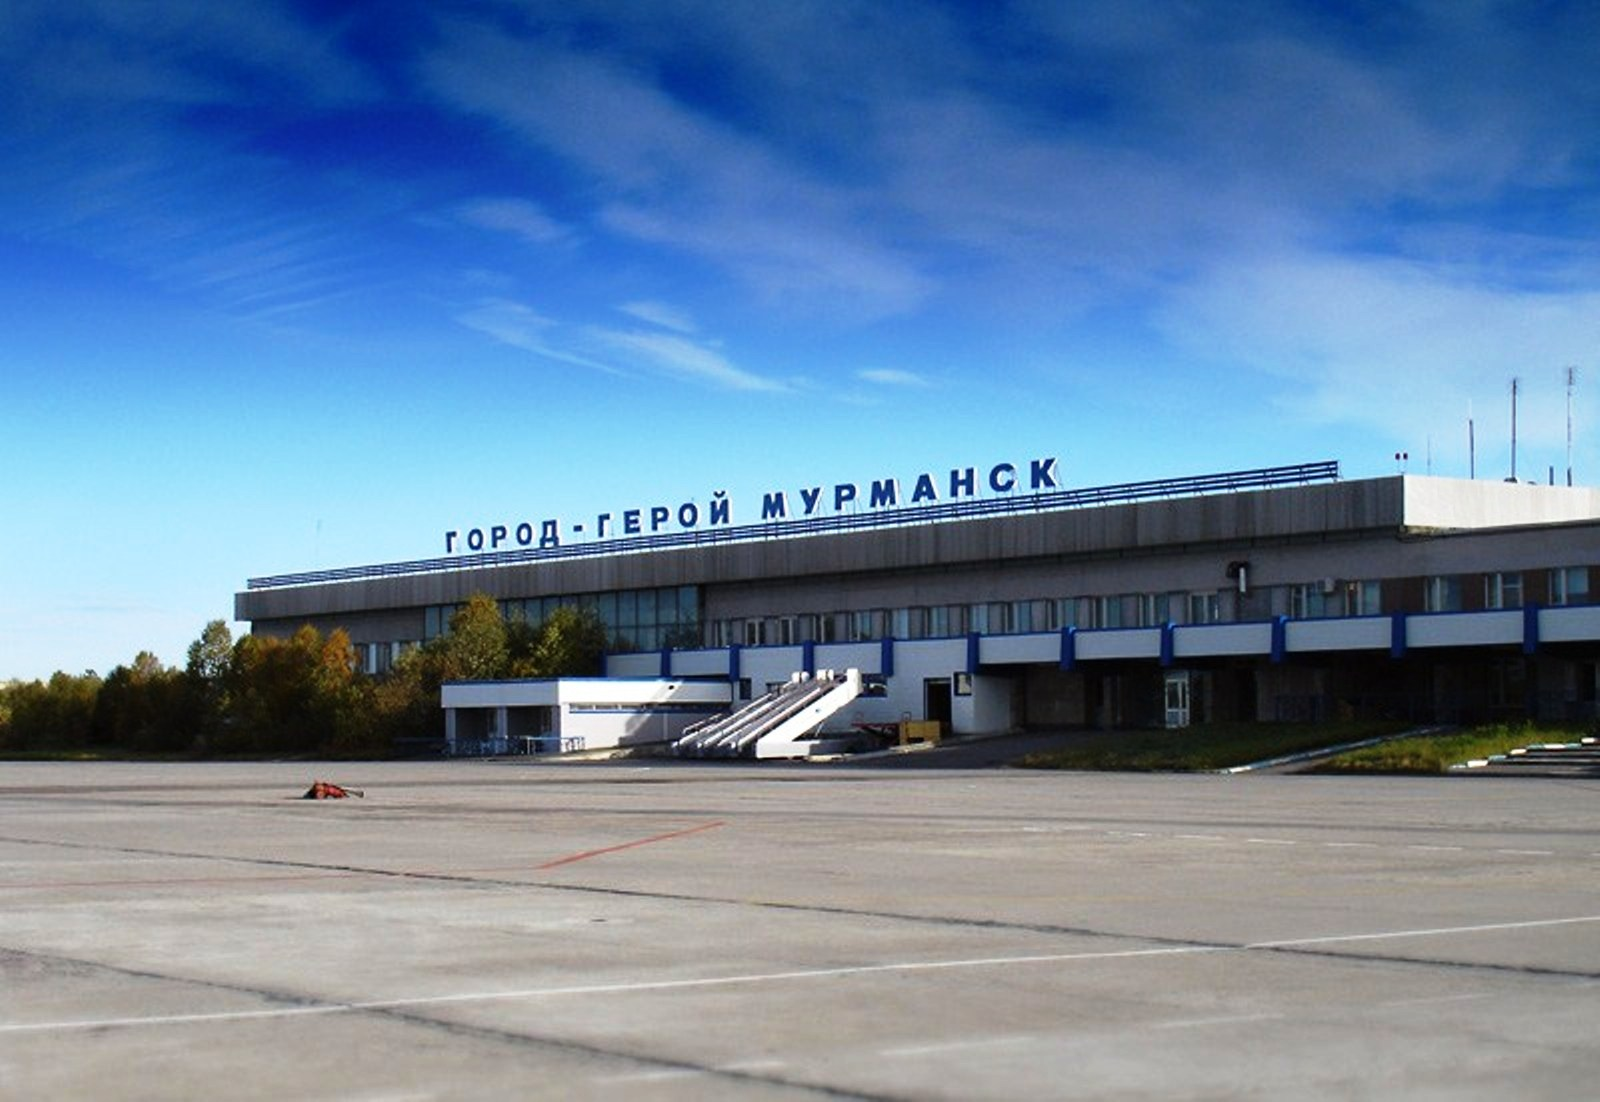 Image result for Аэропорт Мурманска